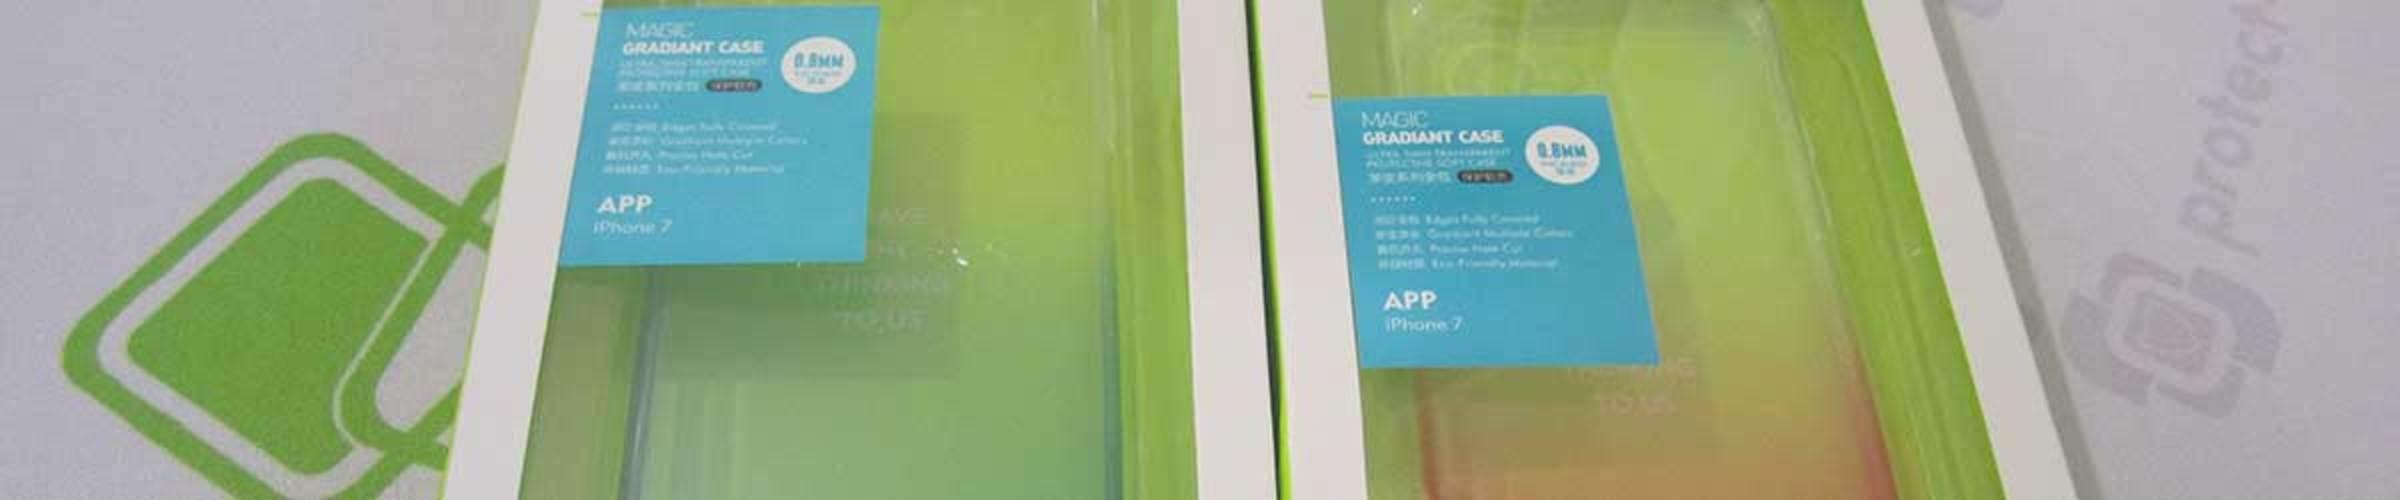 Обзор градиентного чехла для iPhone 7/8 - 7Plus/8Plus